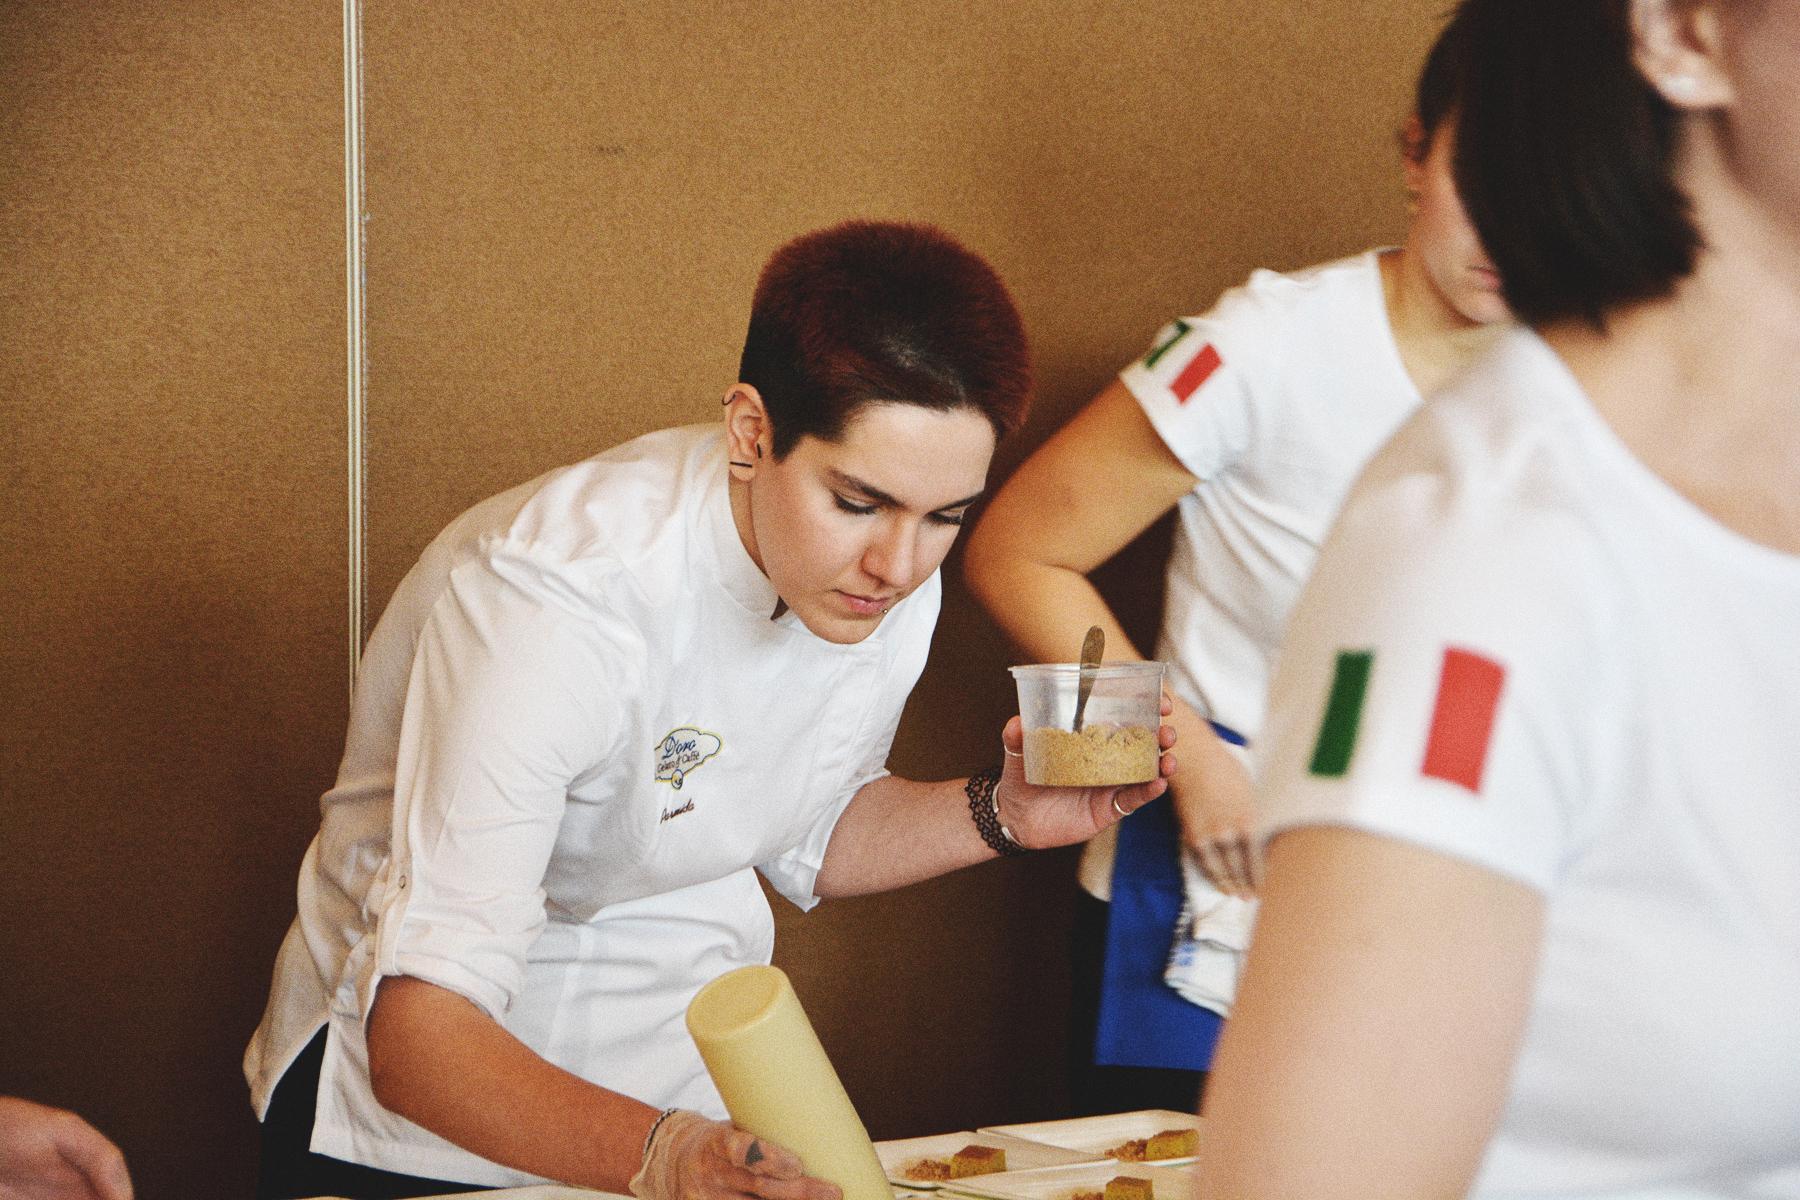 d'oro gelato booth at 2020 vancouver wine festival